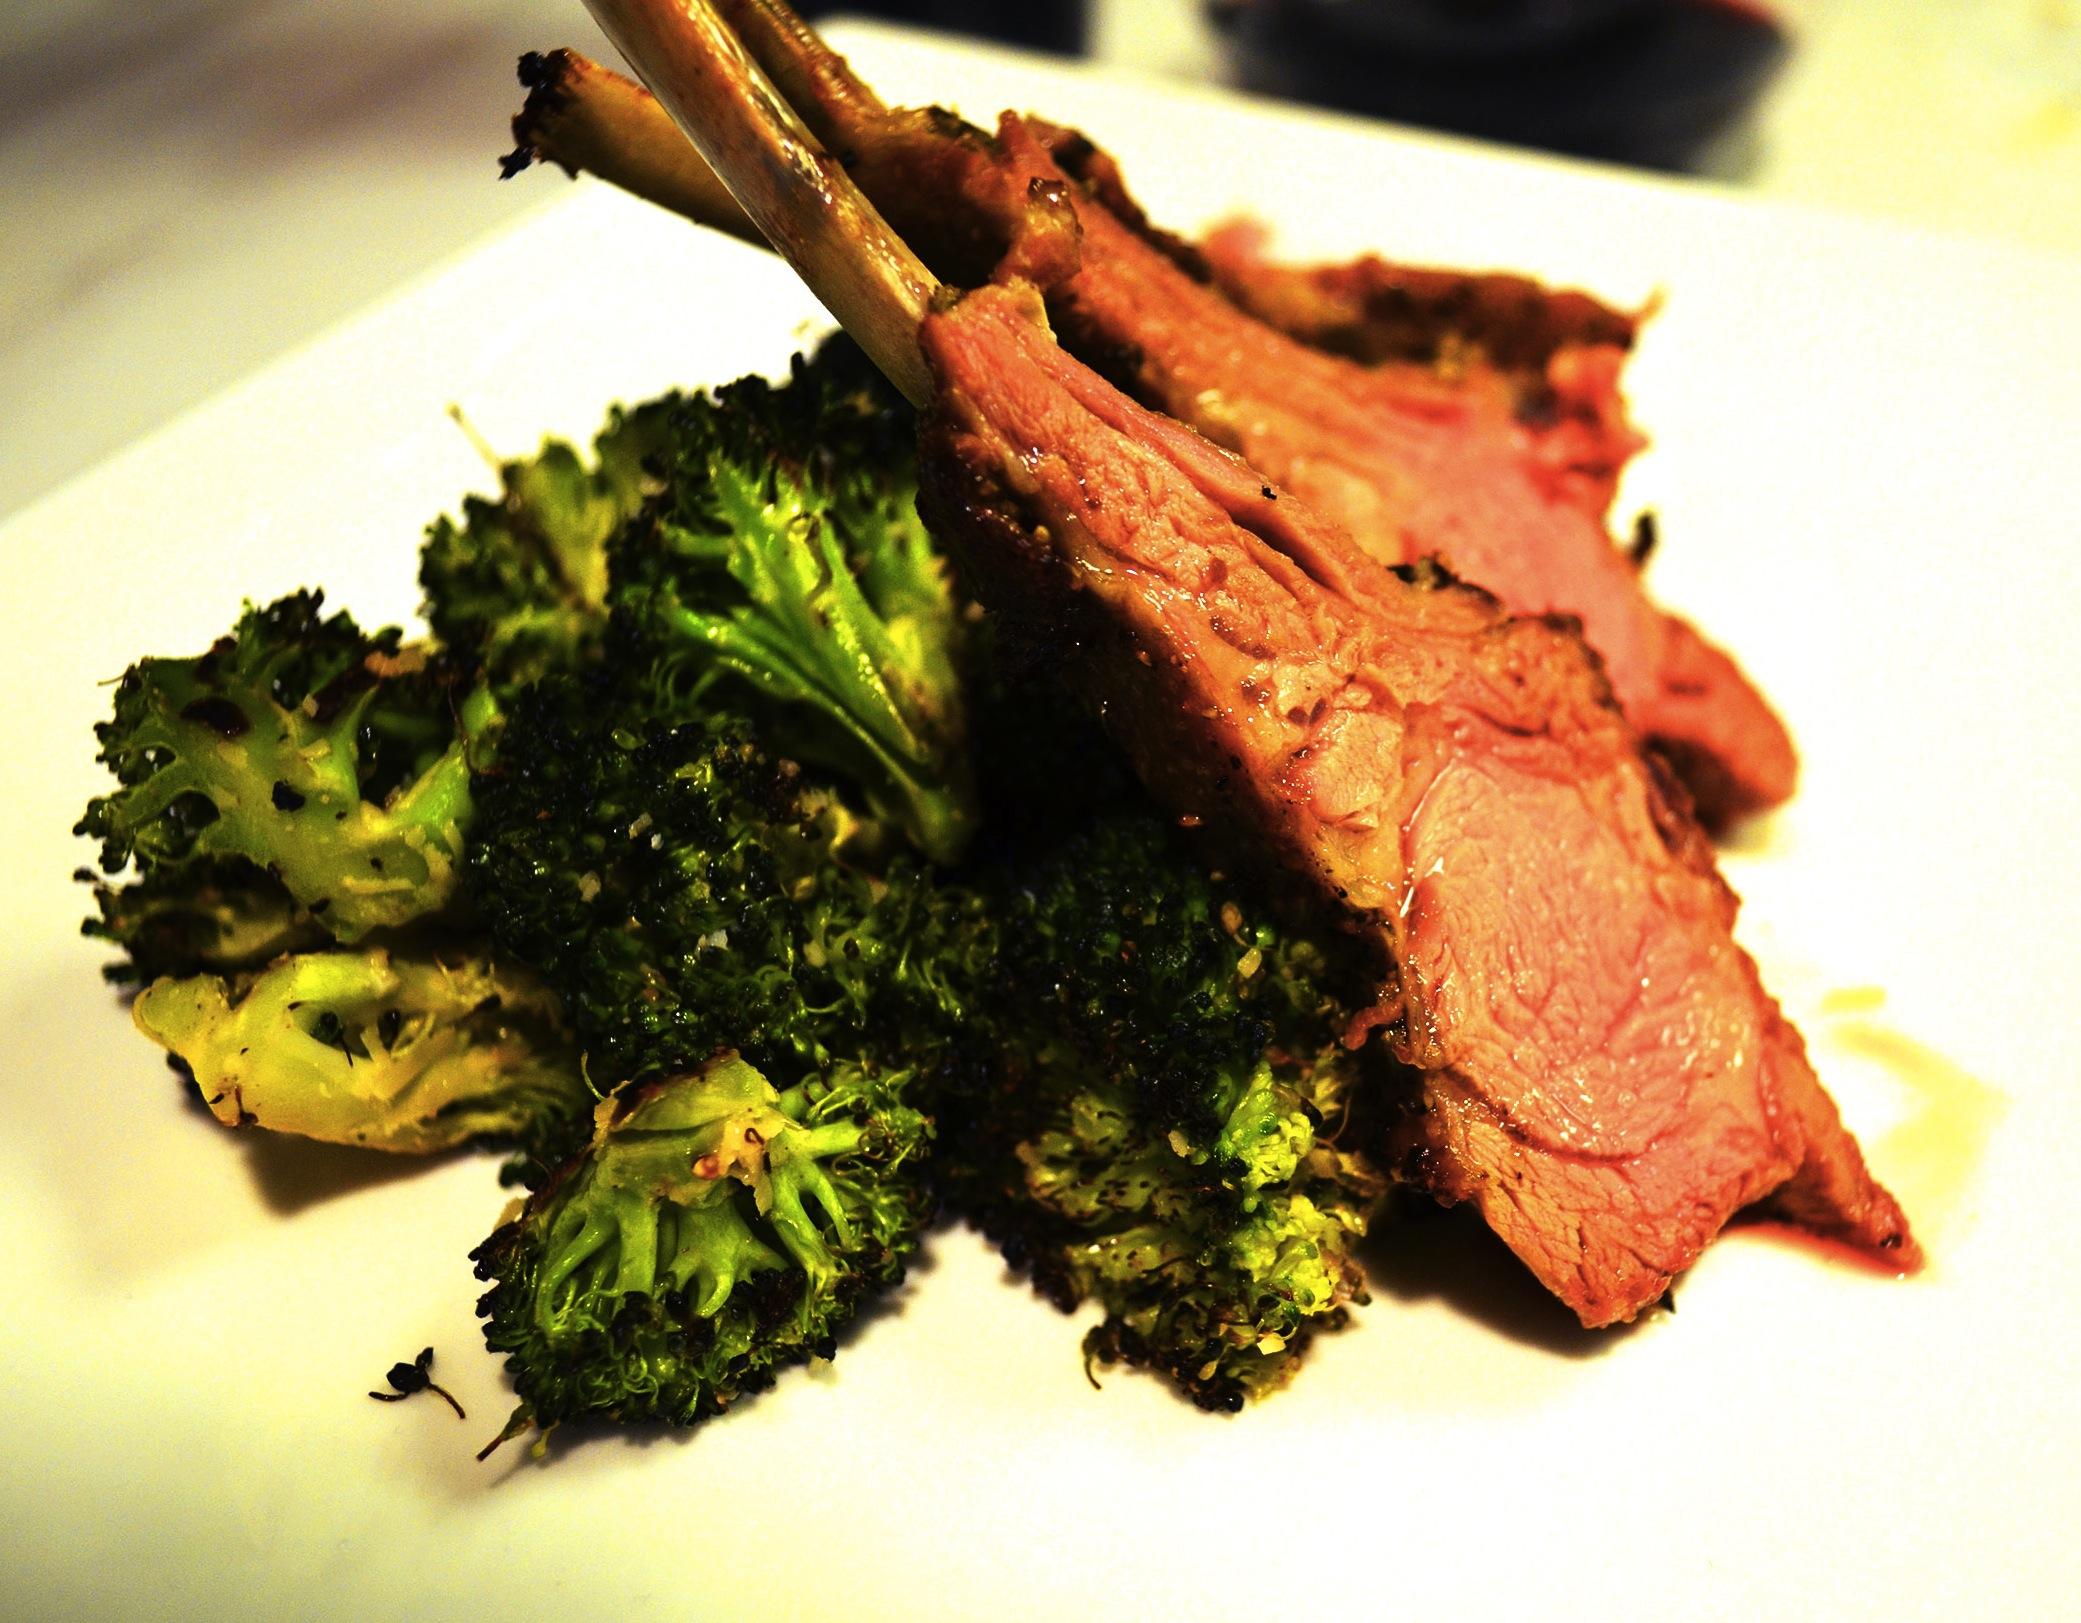 Roasted Rack of Lamb - The Juice | Club W